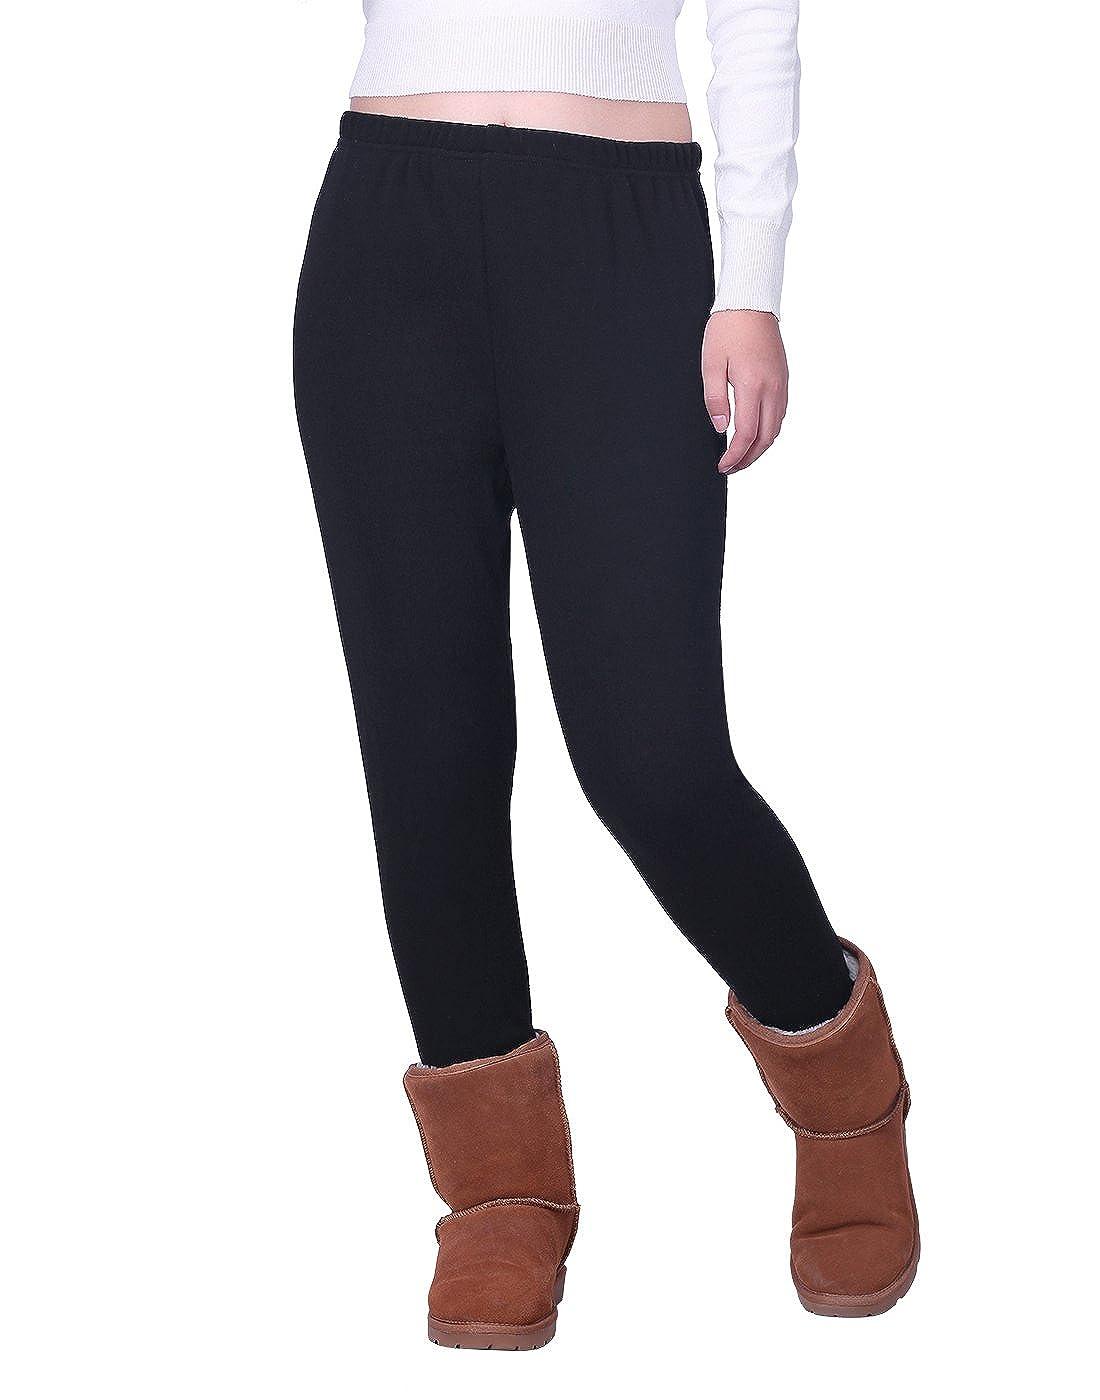 fc8ddf740c175 HDE Women's Winter Leggings Warm Fleece Lined Thermal High Waist Patterned  Pants: Amazon.co.uk: Clothing